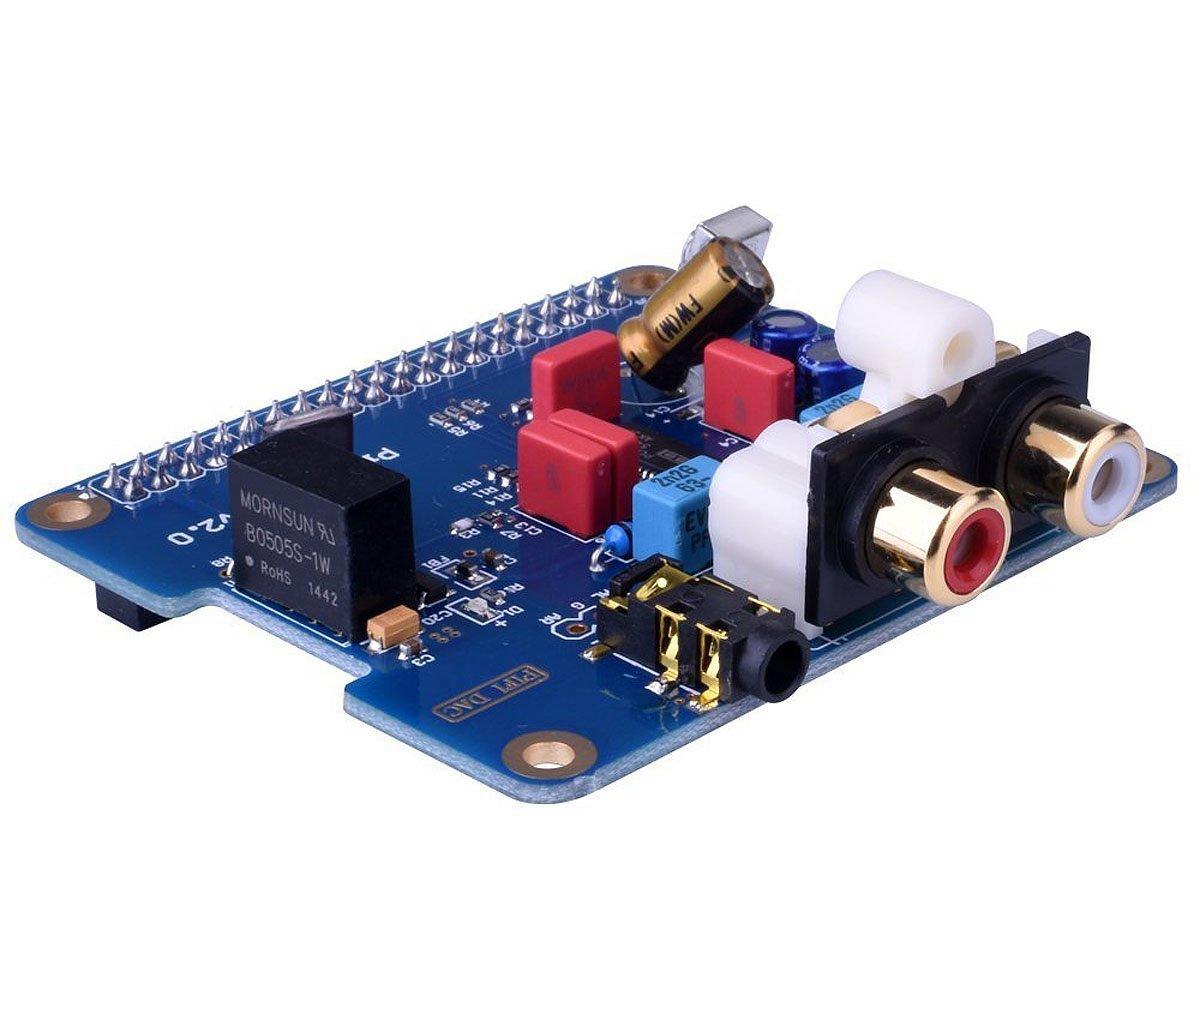 HIFI Digi DAC+ HIFI DAC PCM5122 Sound Card Module I2S Port for Raspberry Pi 3 2 Model B B+ Audio Card Pinboard V2.0 Board